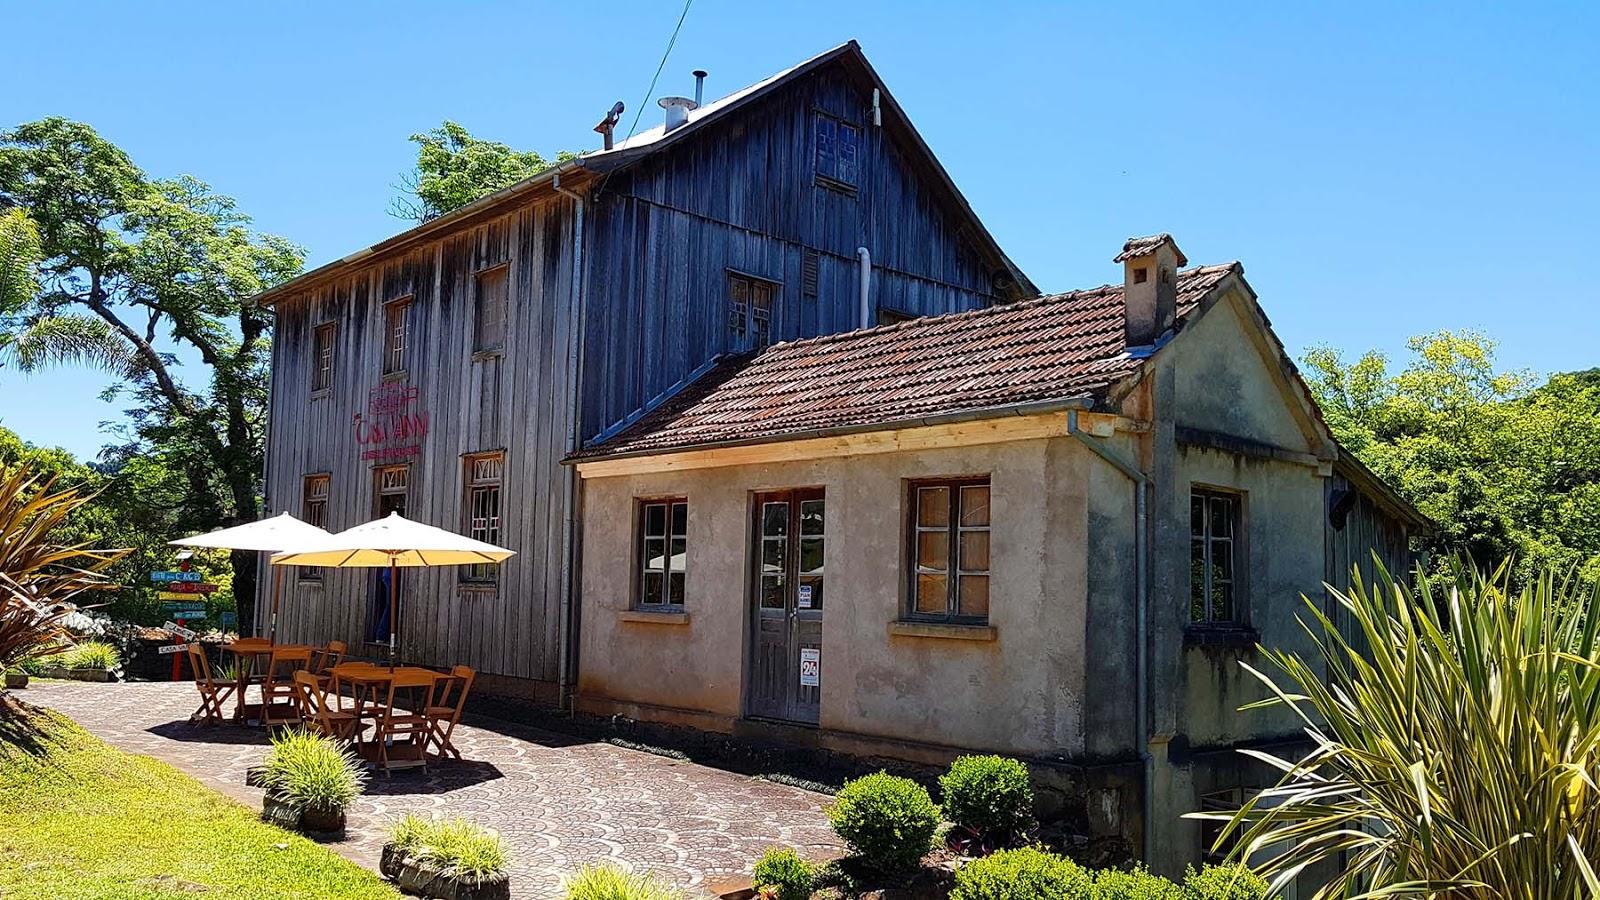 Casa Vanni, Caminhos de Pedra